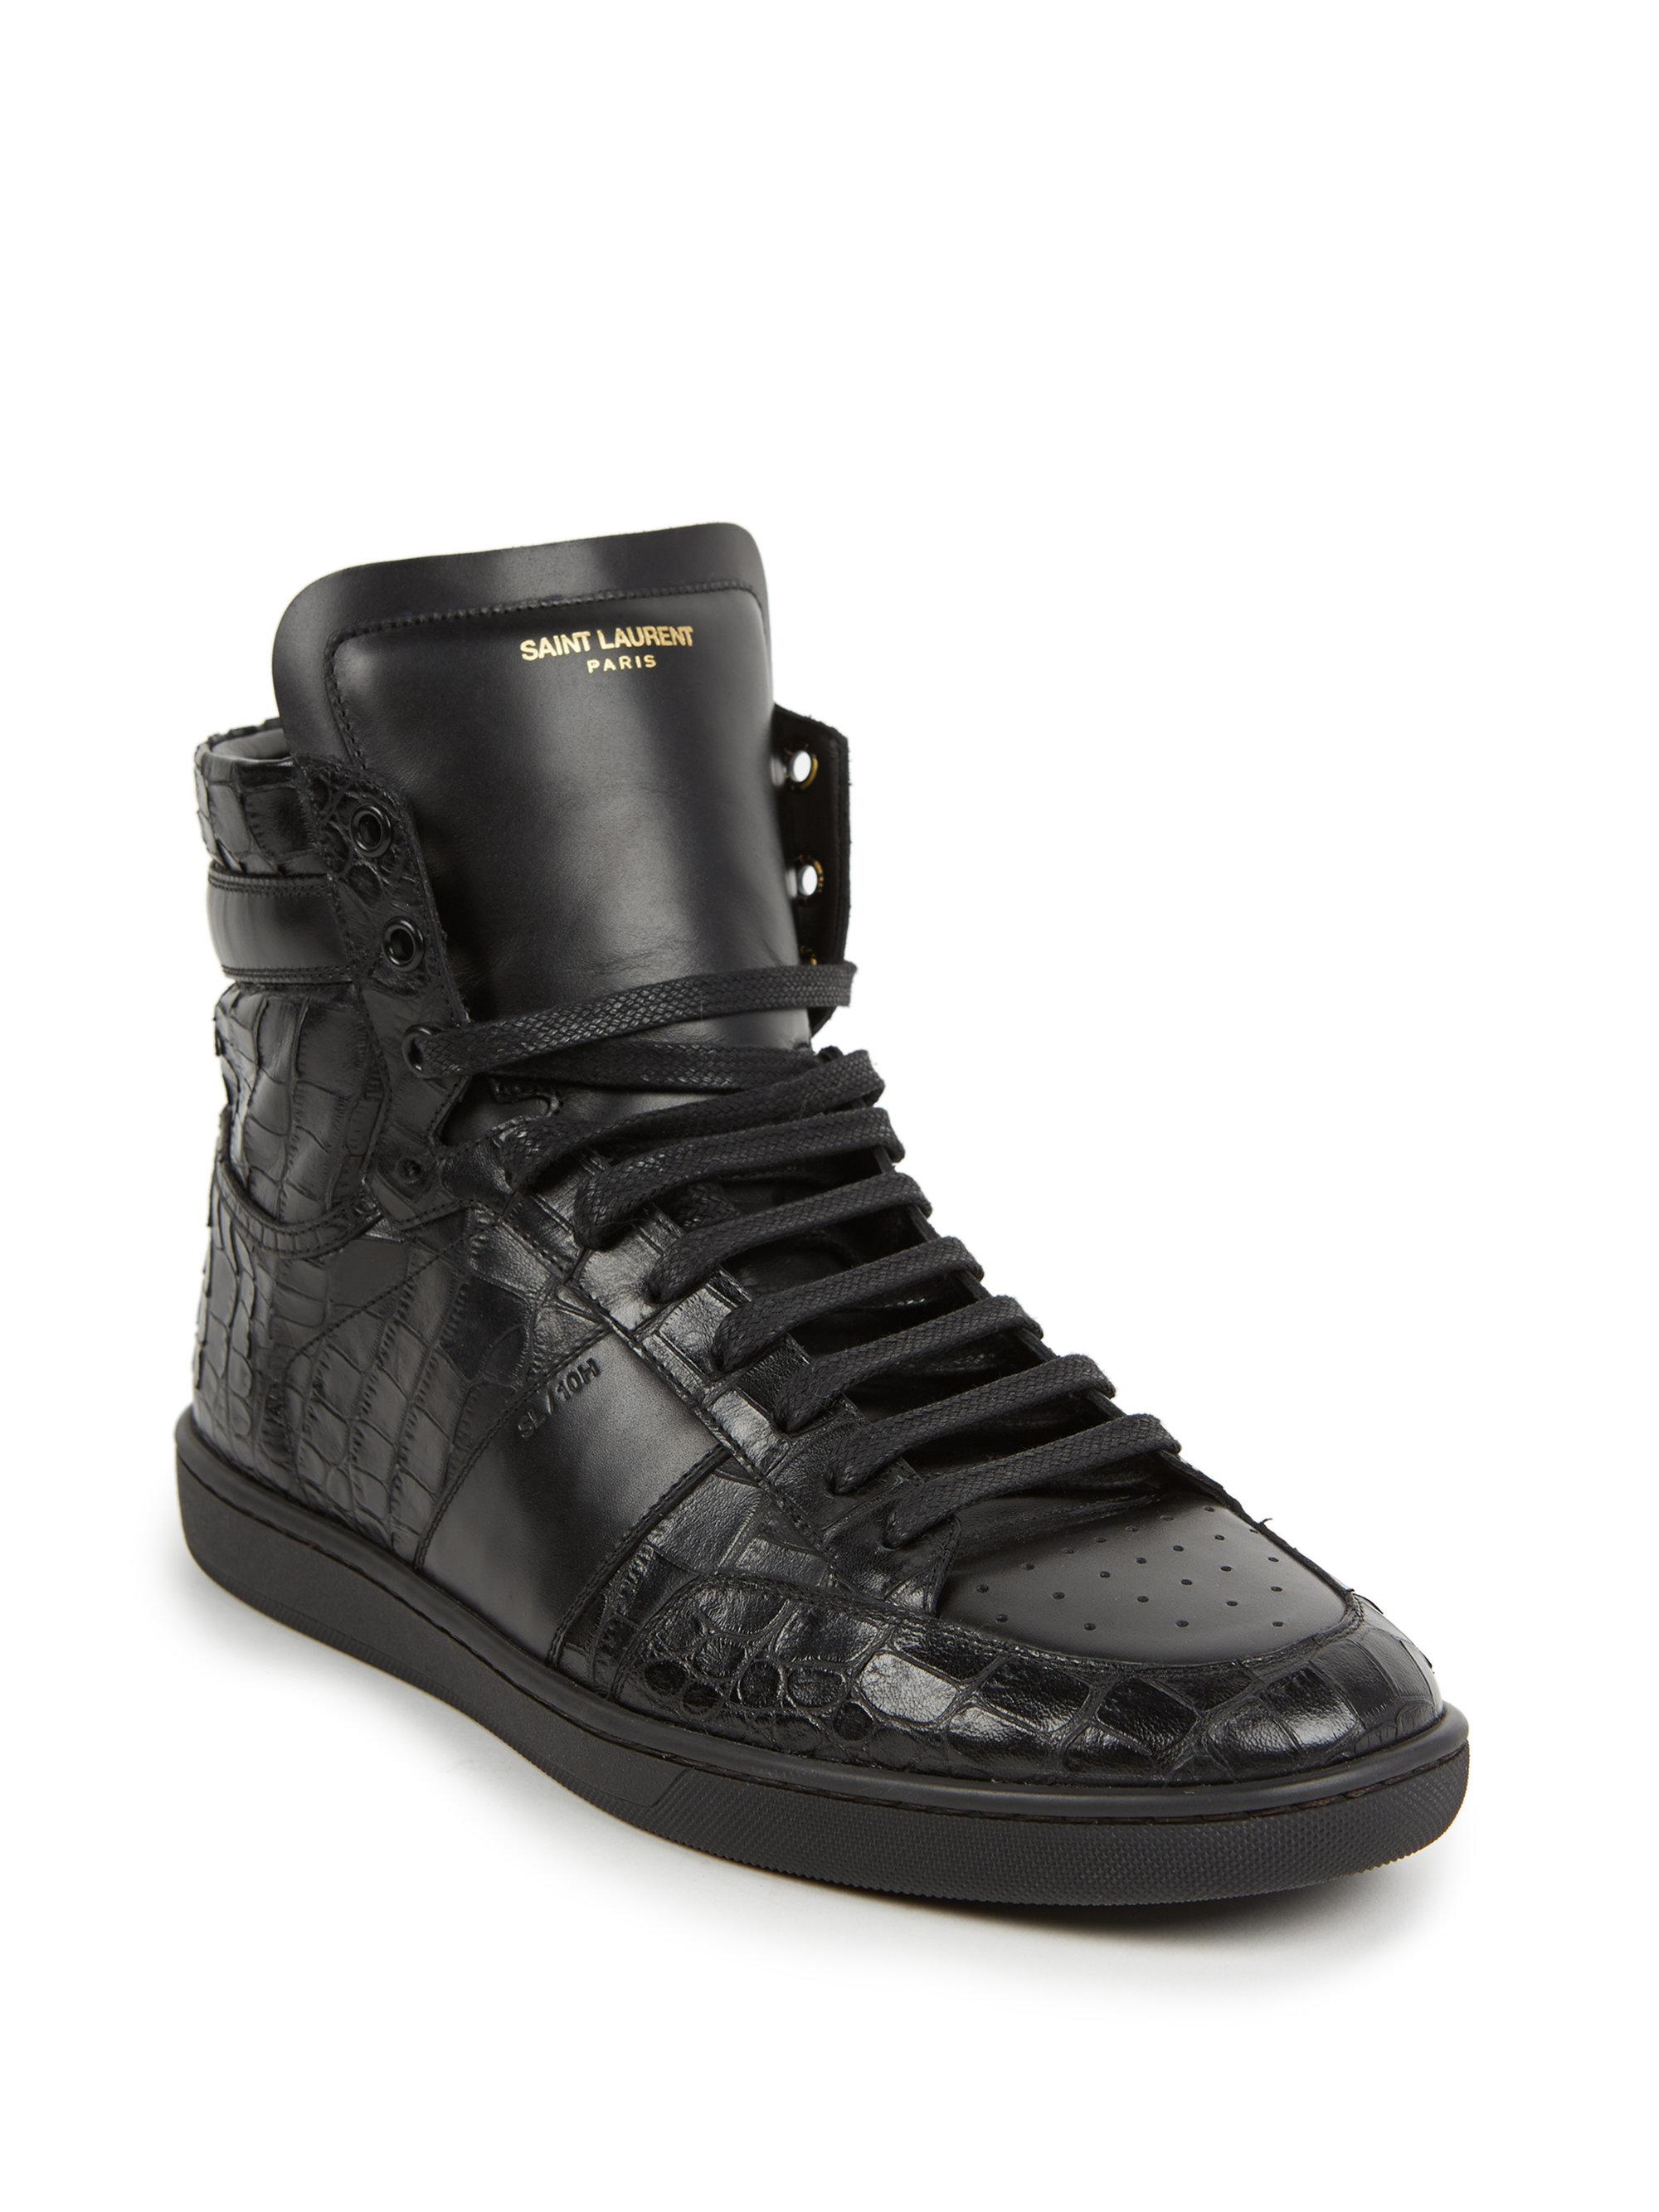 saint laurent croc embossed leather high top sneakers in black for men lyst. Black Bedroom Furniture Sets. Home Design Ideas